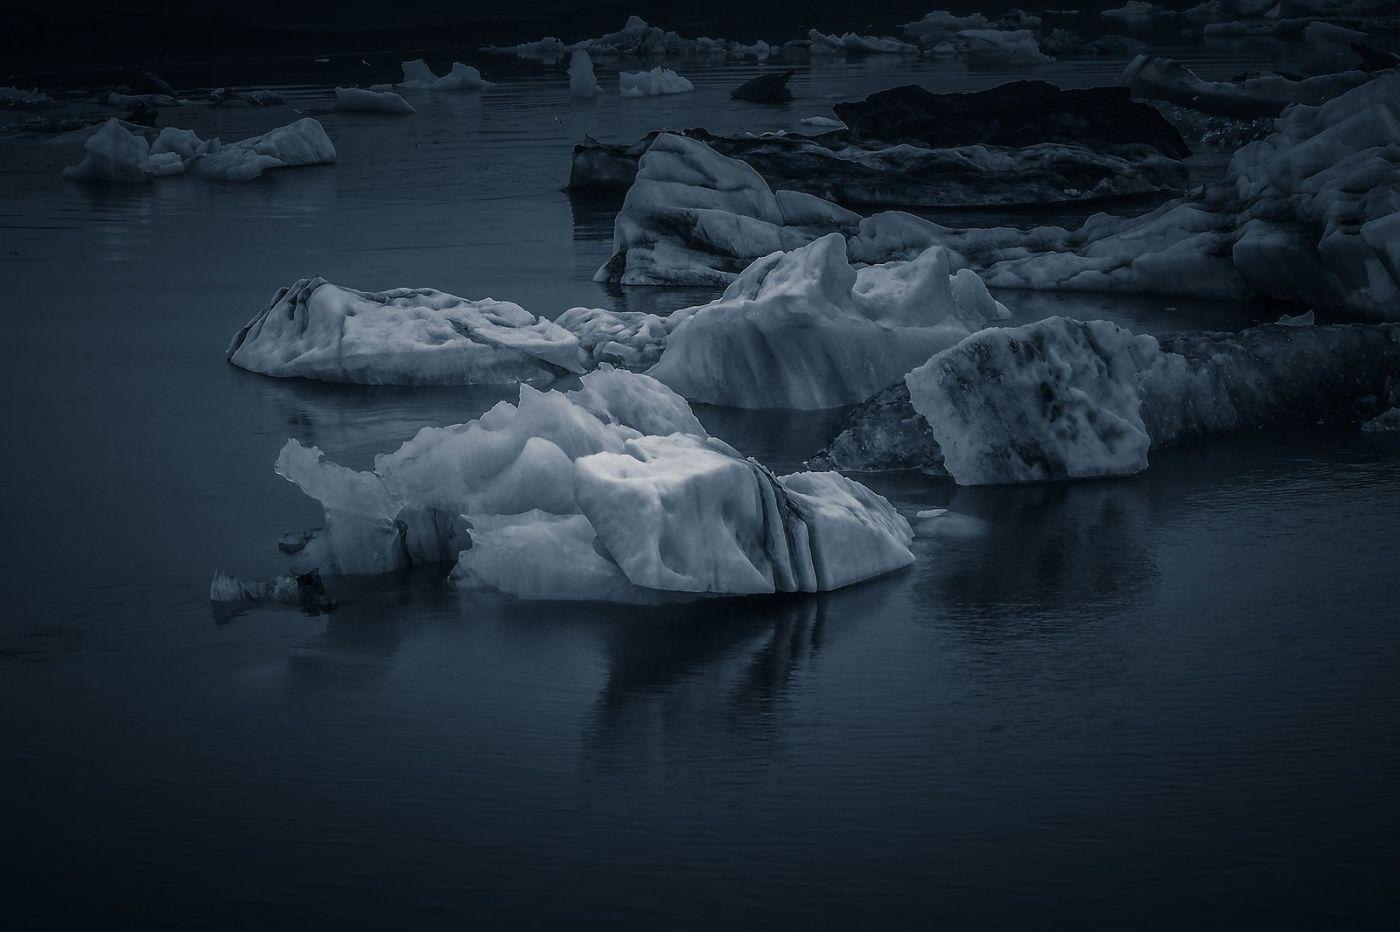 冰岛冰川泻湖(Glacier Lagoon),流动的冰川_图1-20